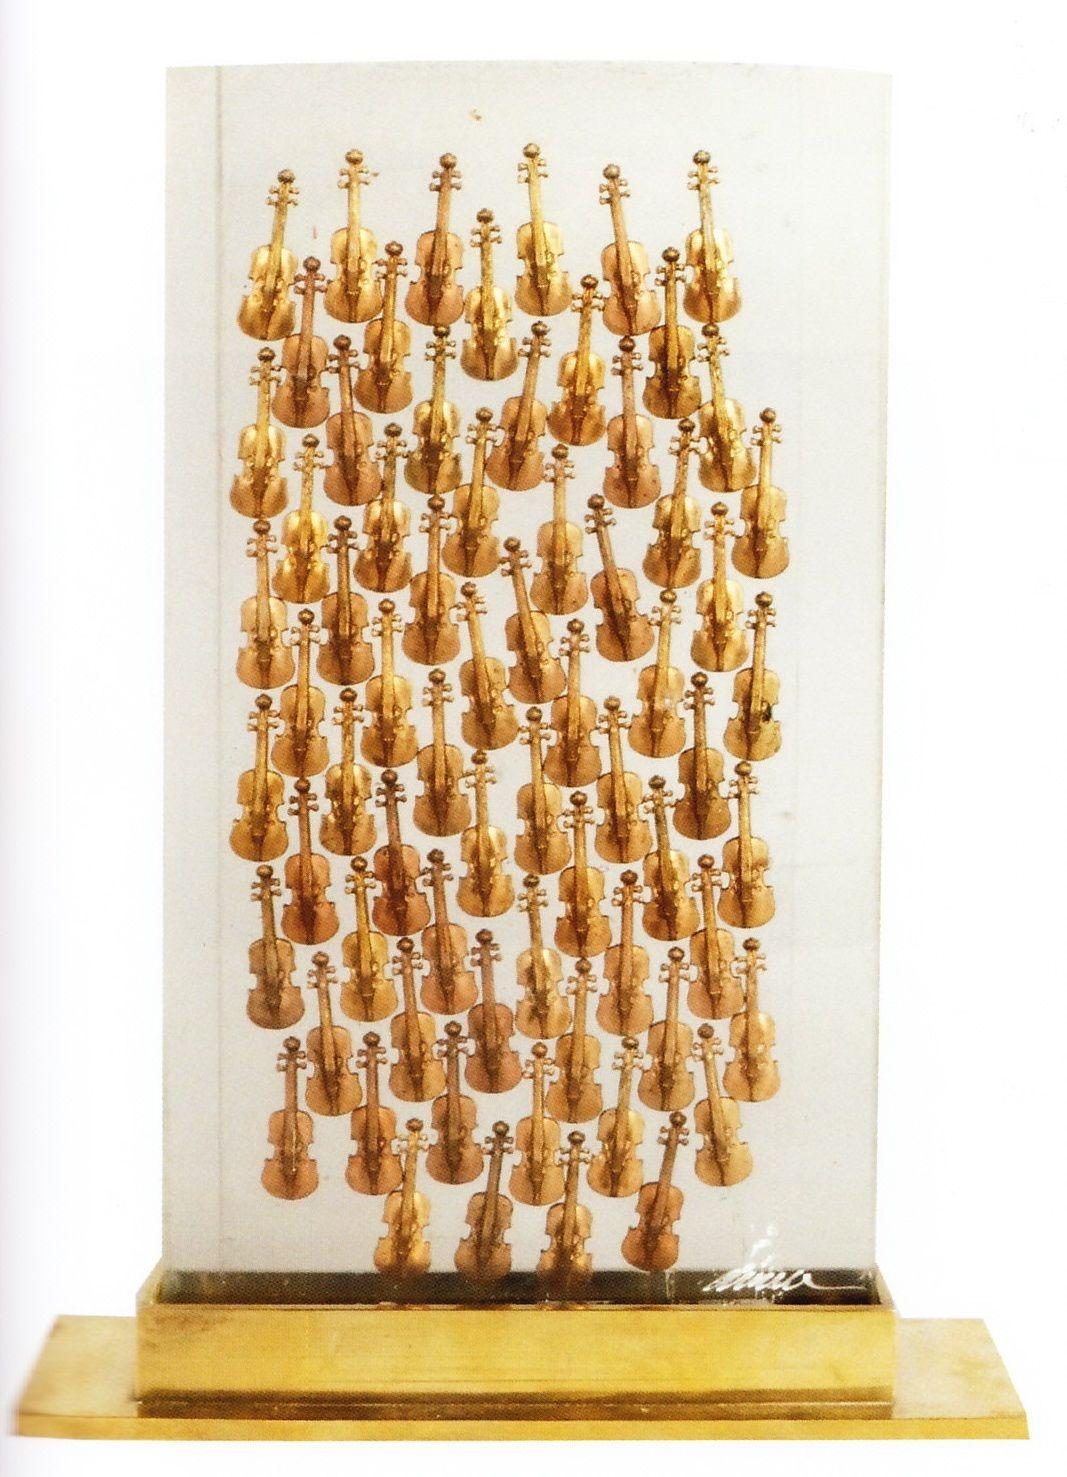 Arman - 100 Violons, Sculpture